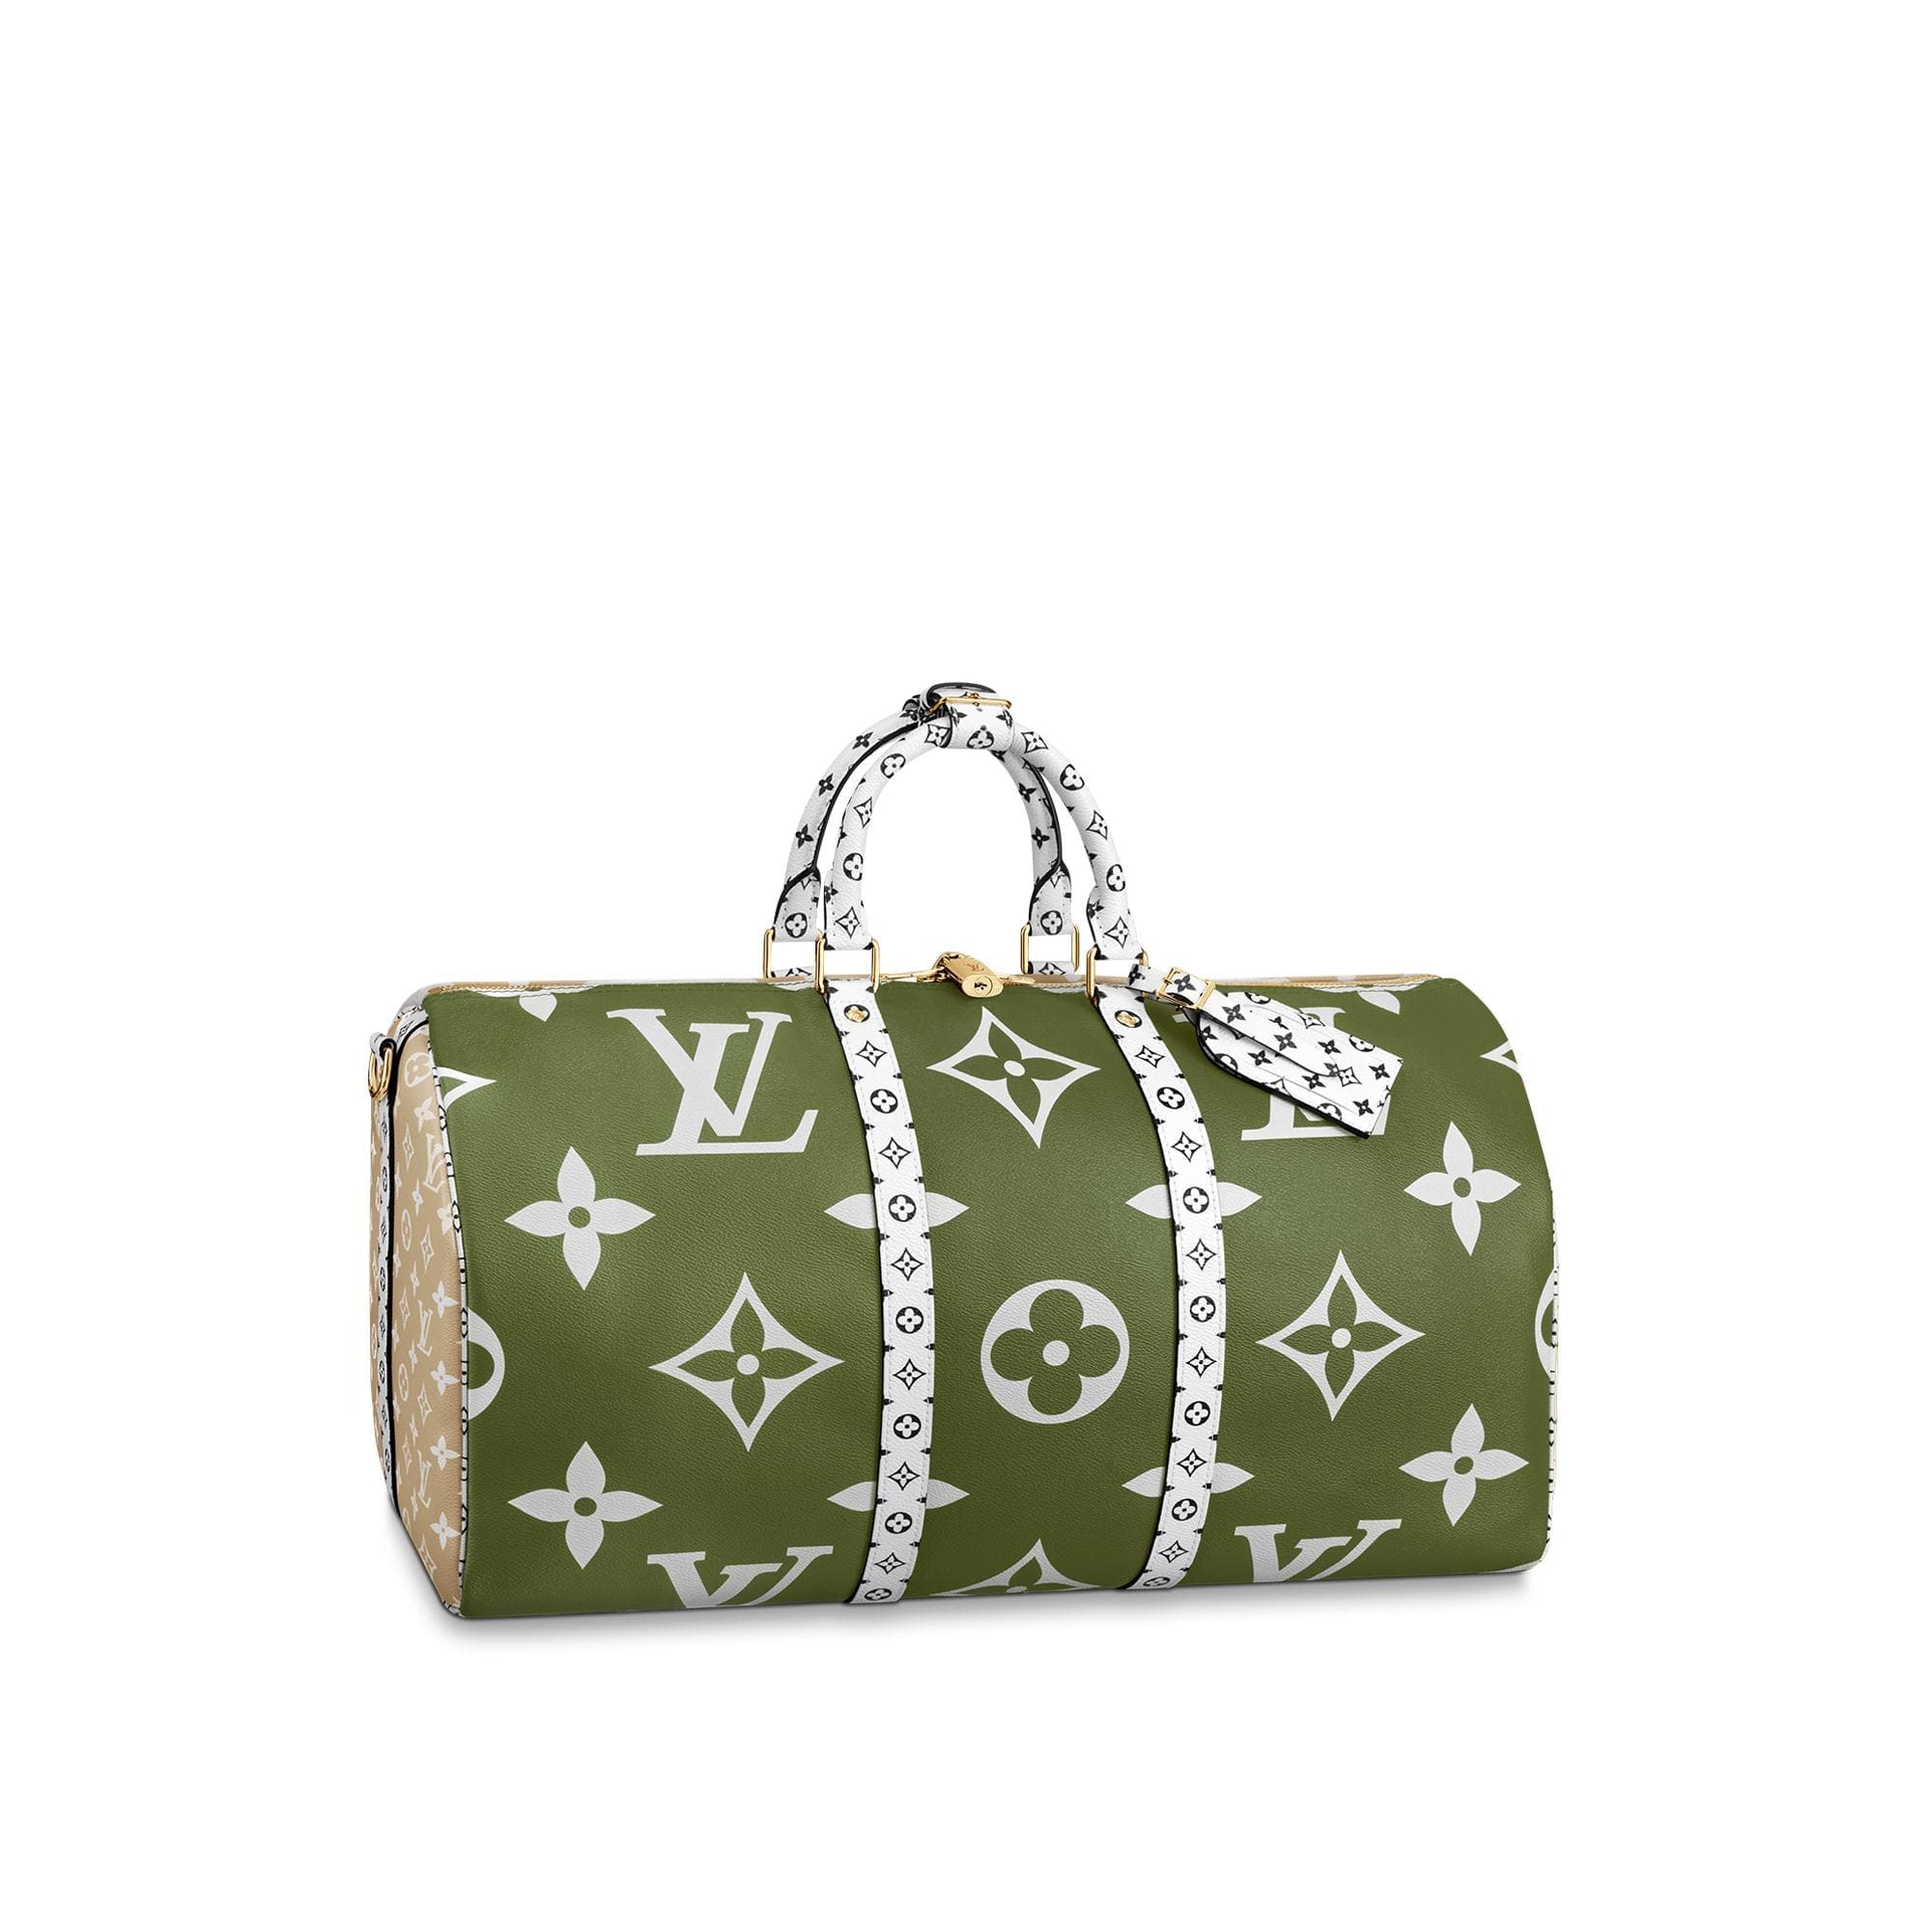 Louis Vuitton Keepall Bandouliere Monogram Giant 50 Khaki Green/Beige